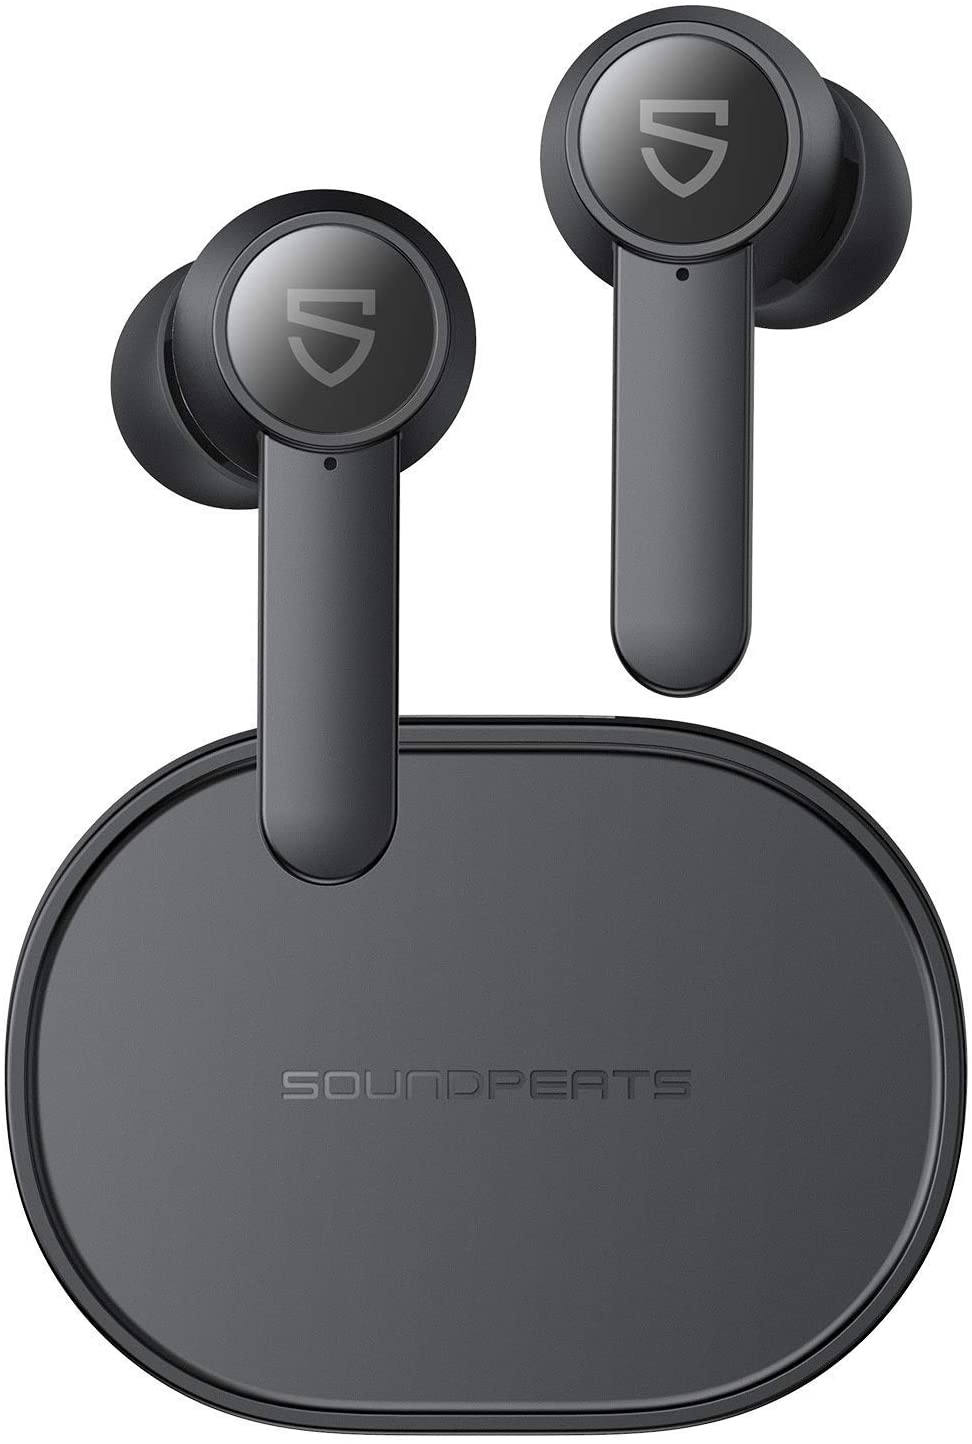 Soundpeats Q True Wireless Earphones